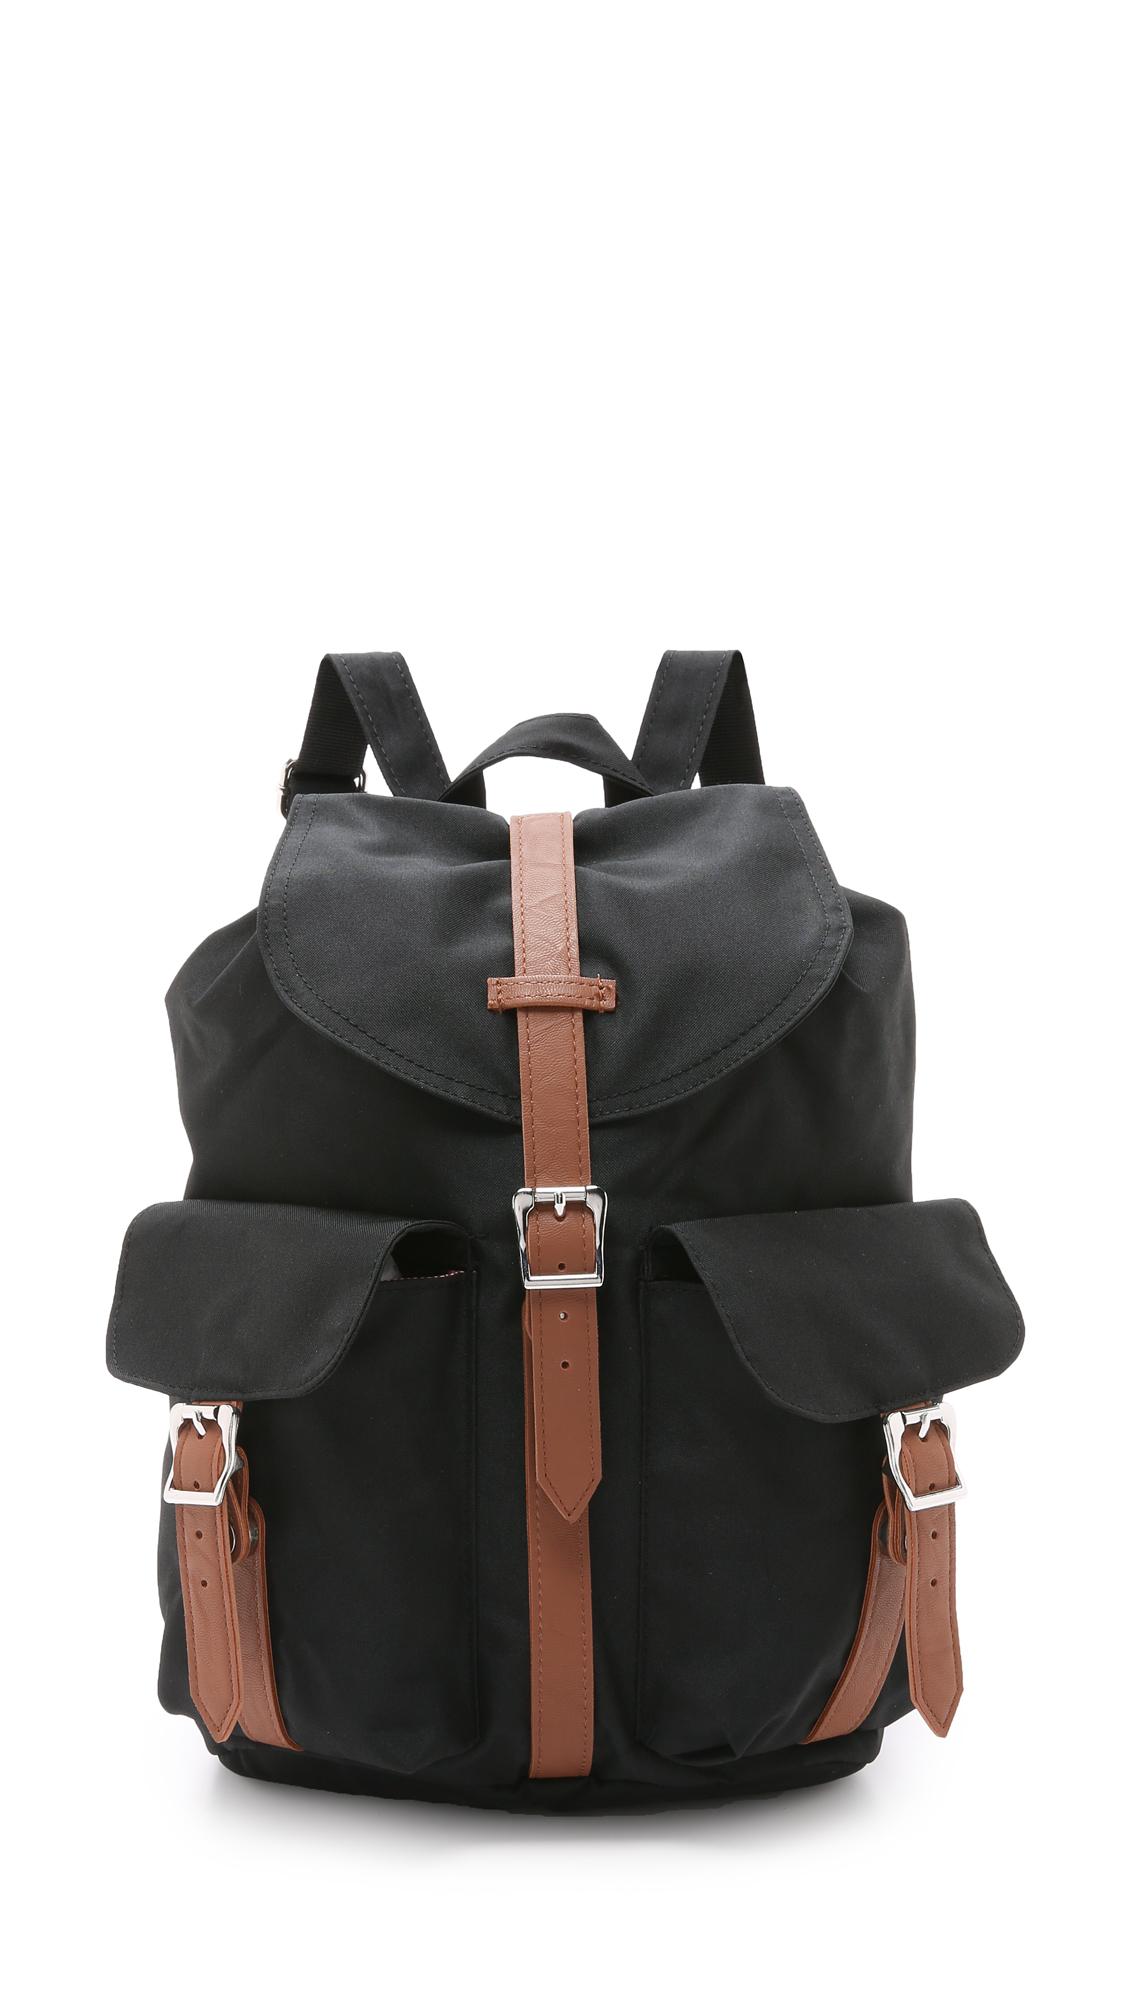 X-SMALL DAWSON BACKPACK - BLACK